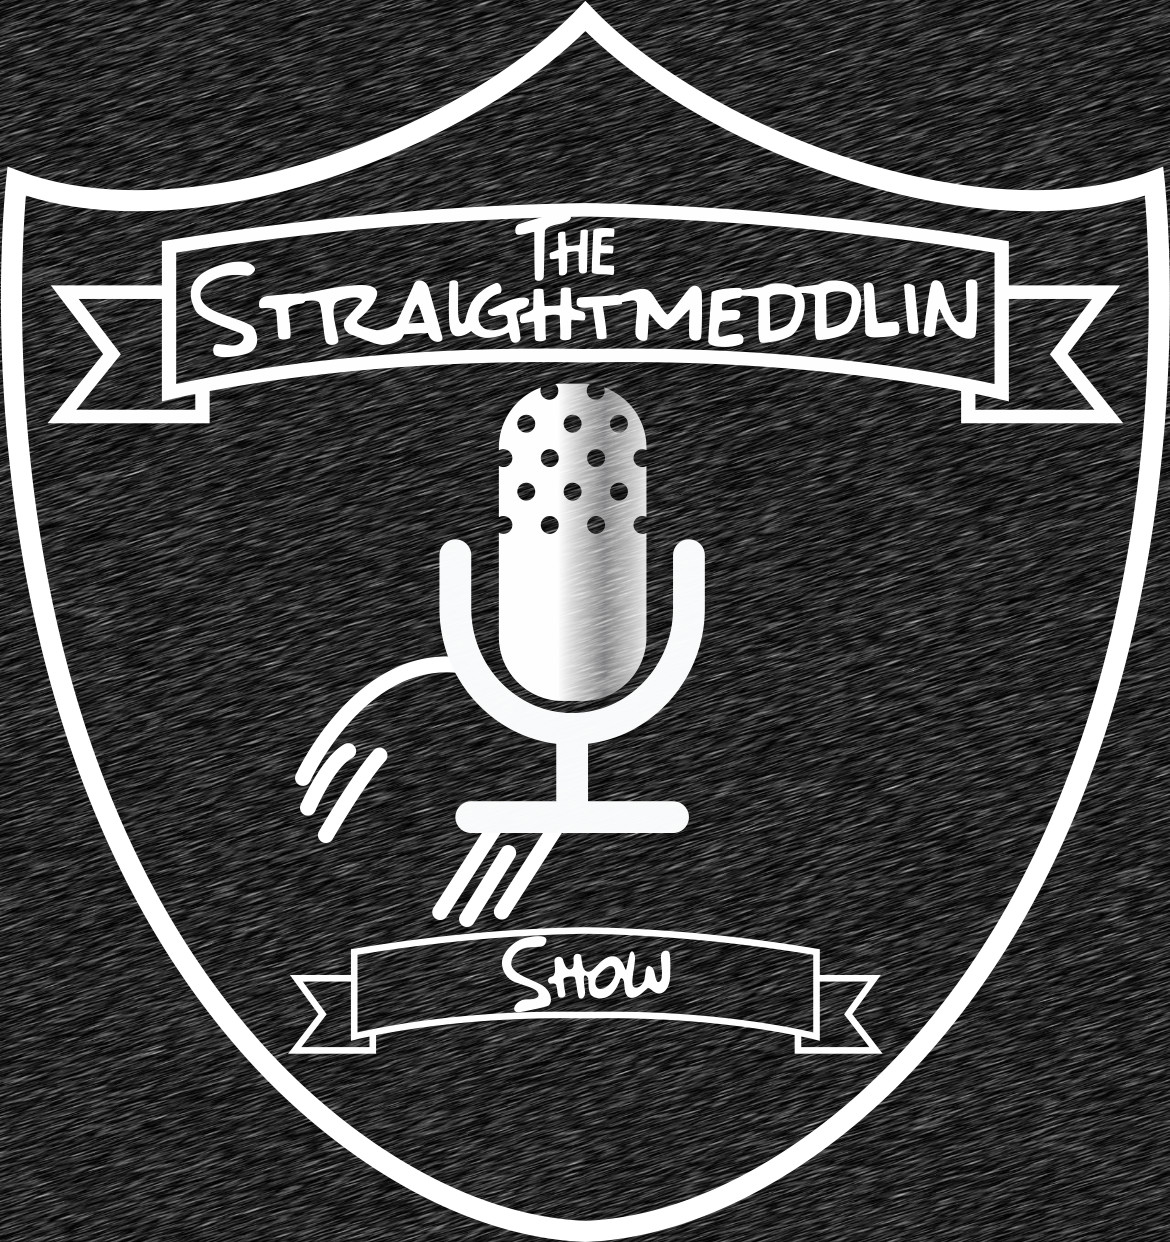 The #Straightmeddlin Show show art